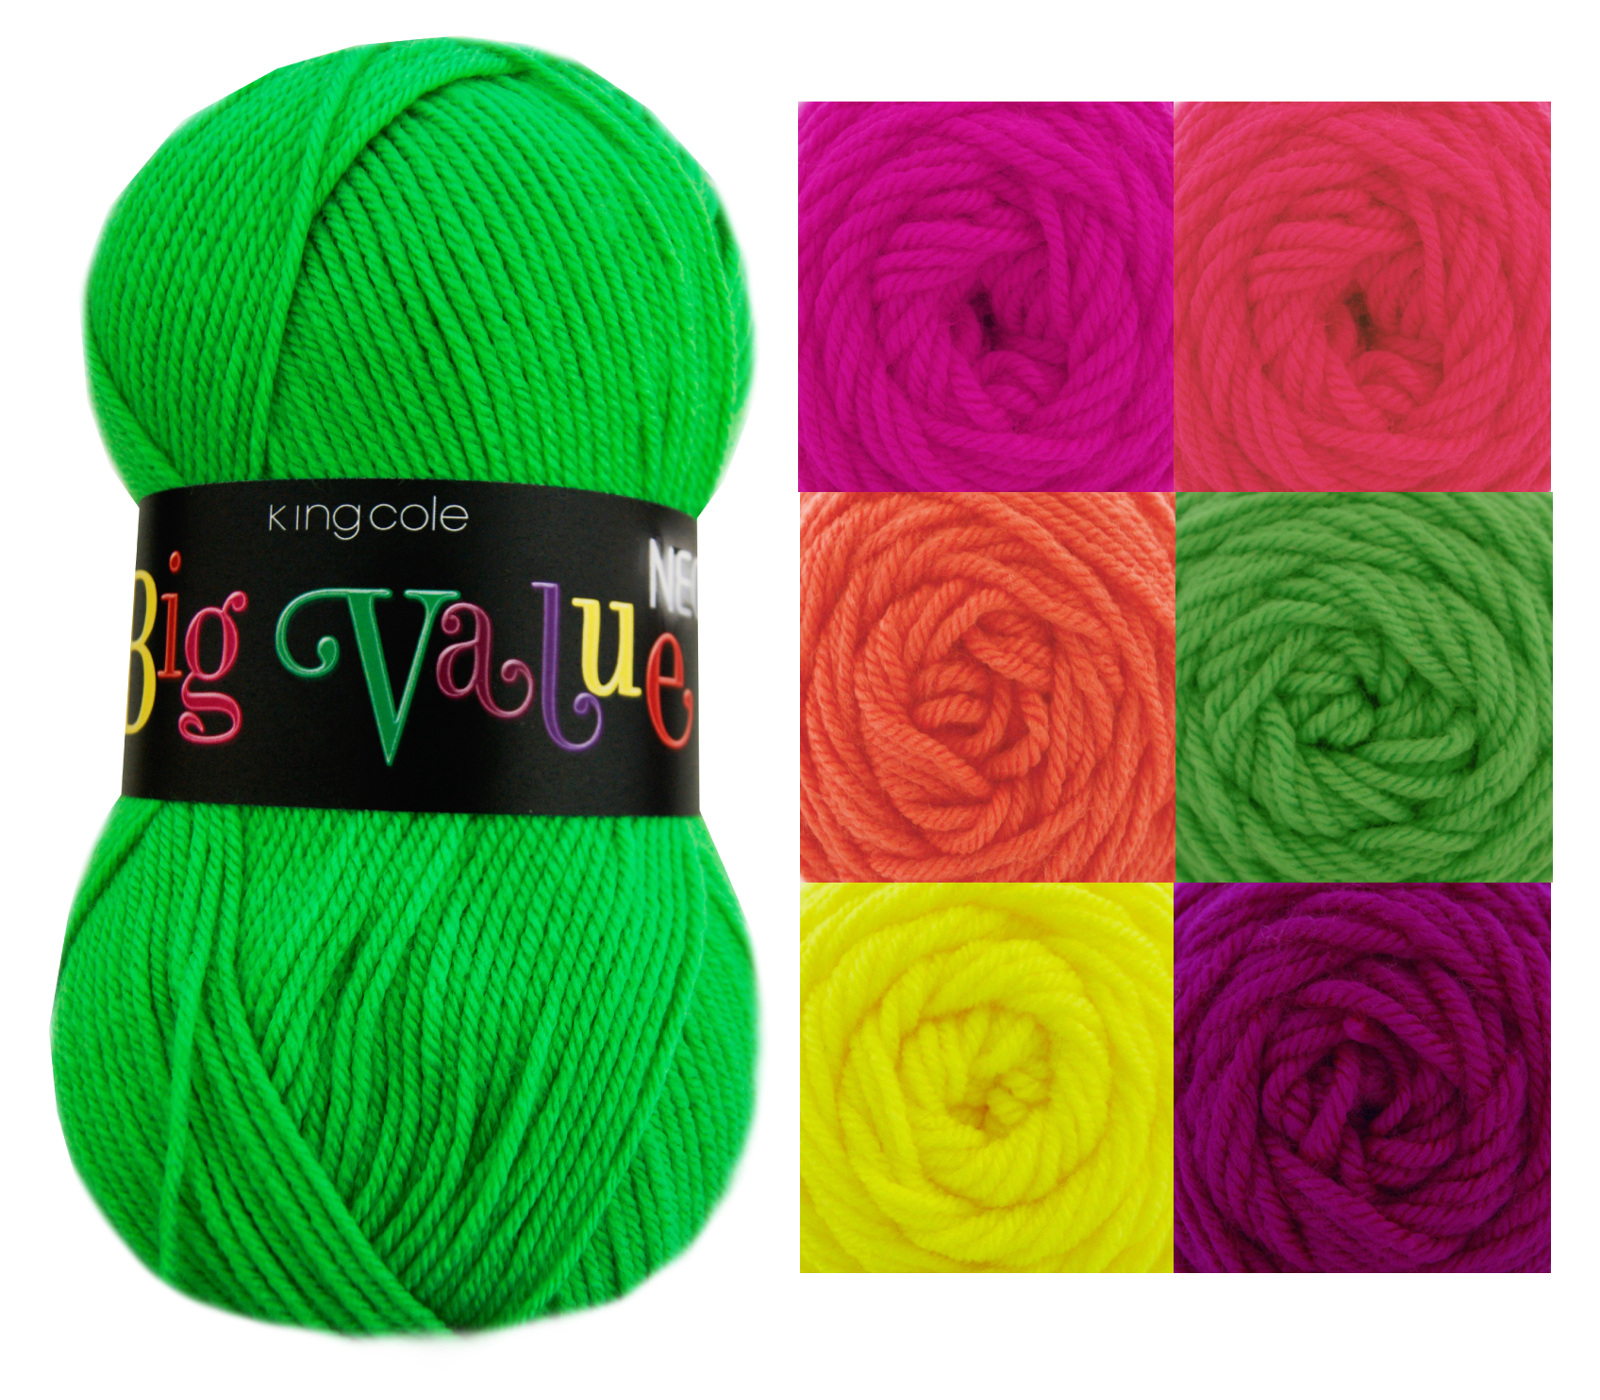 Large Knitting Needles And Wool Uk : King cole big value neon double knitting yarn acrylic